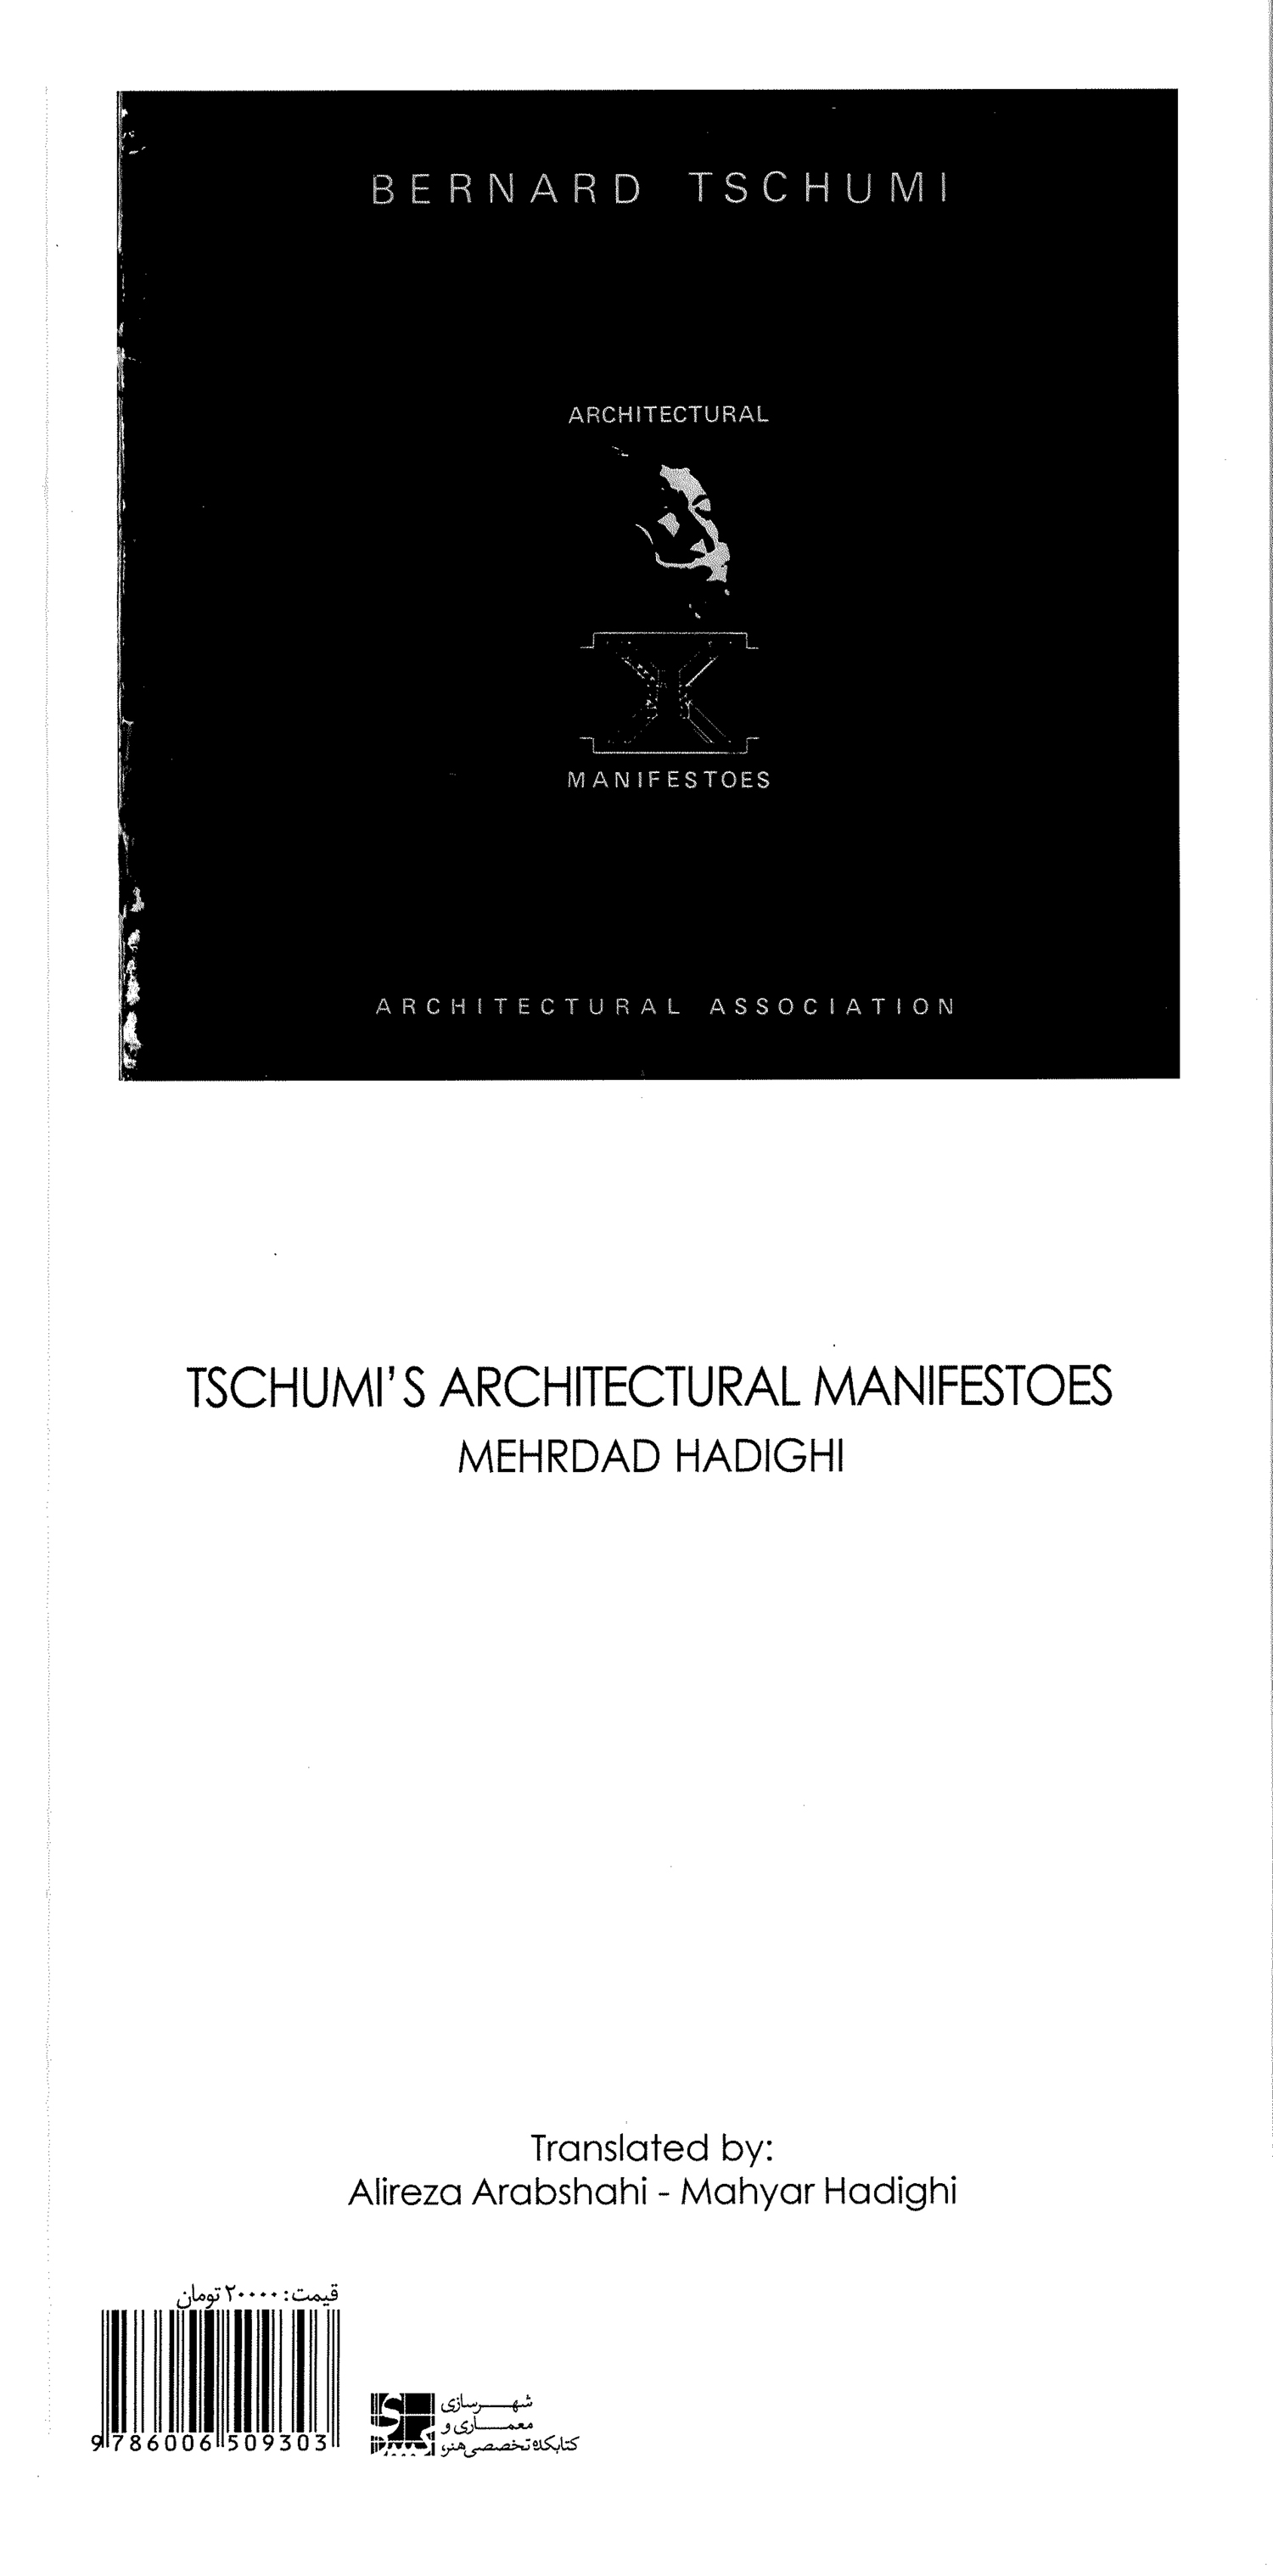 Tschumi's Architectural Manifestoes.jpg